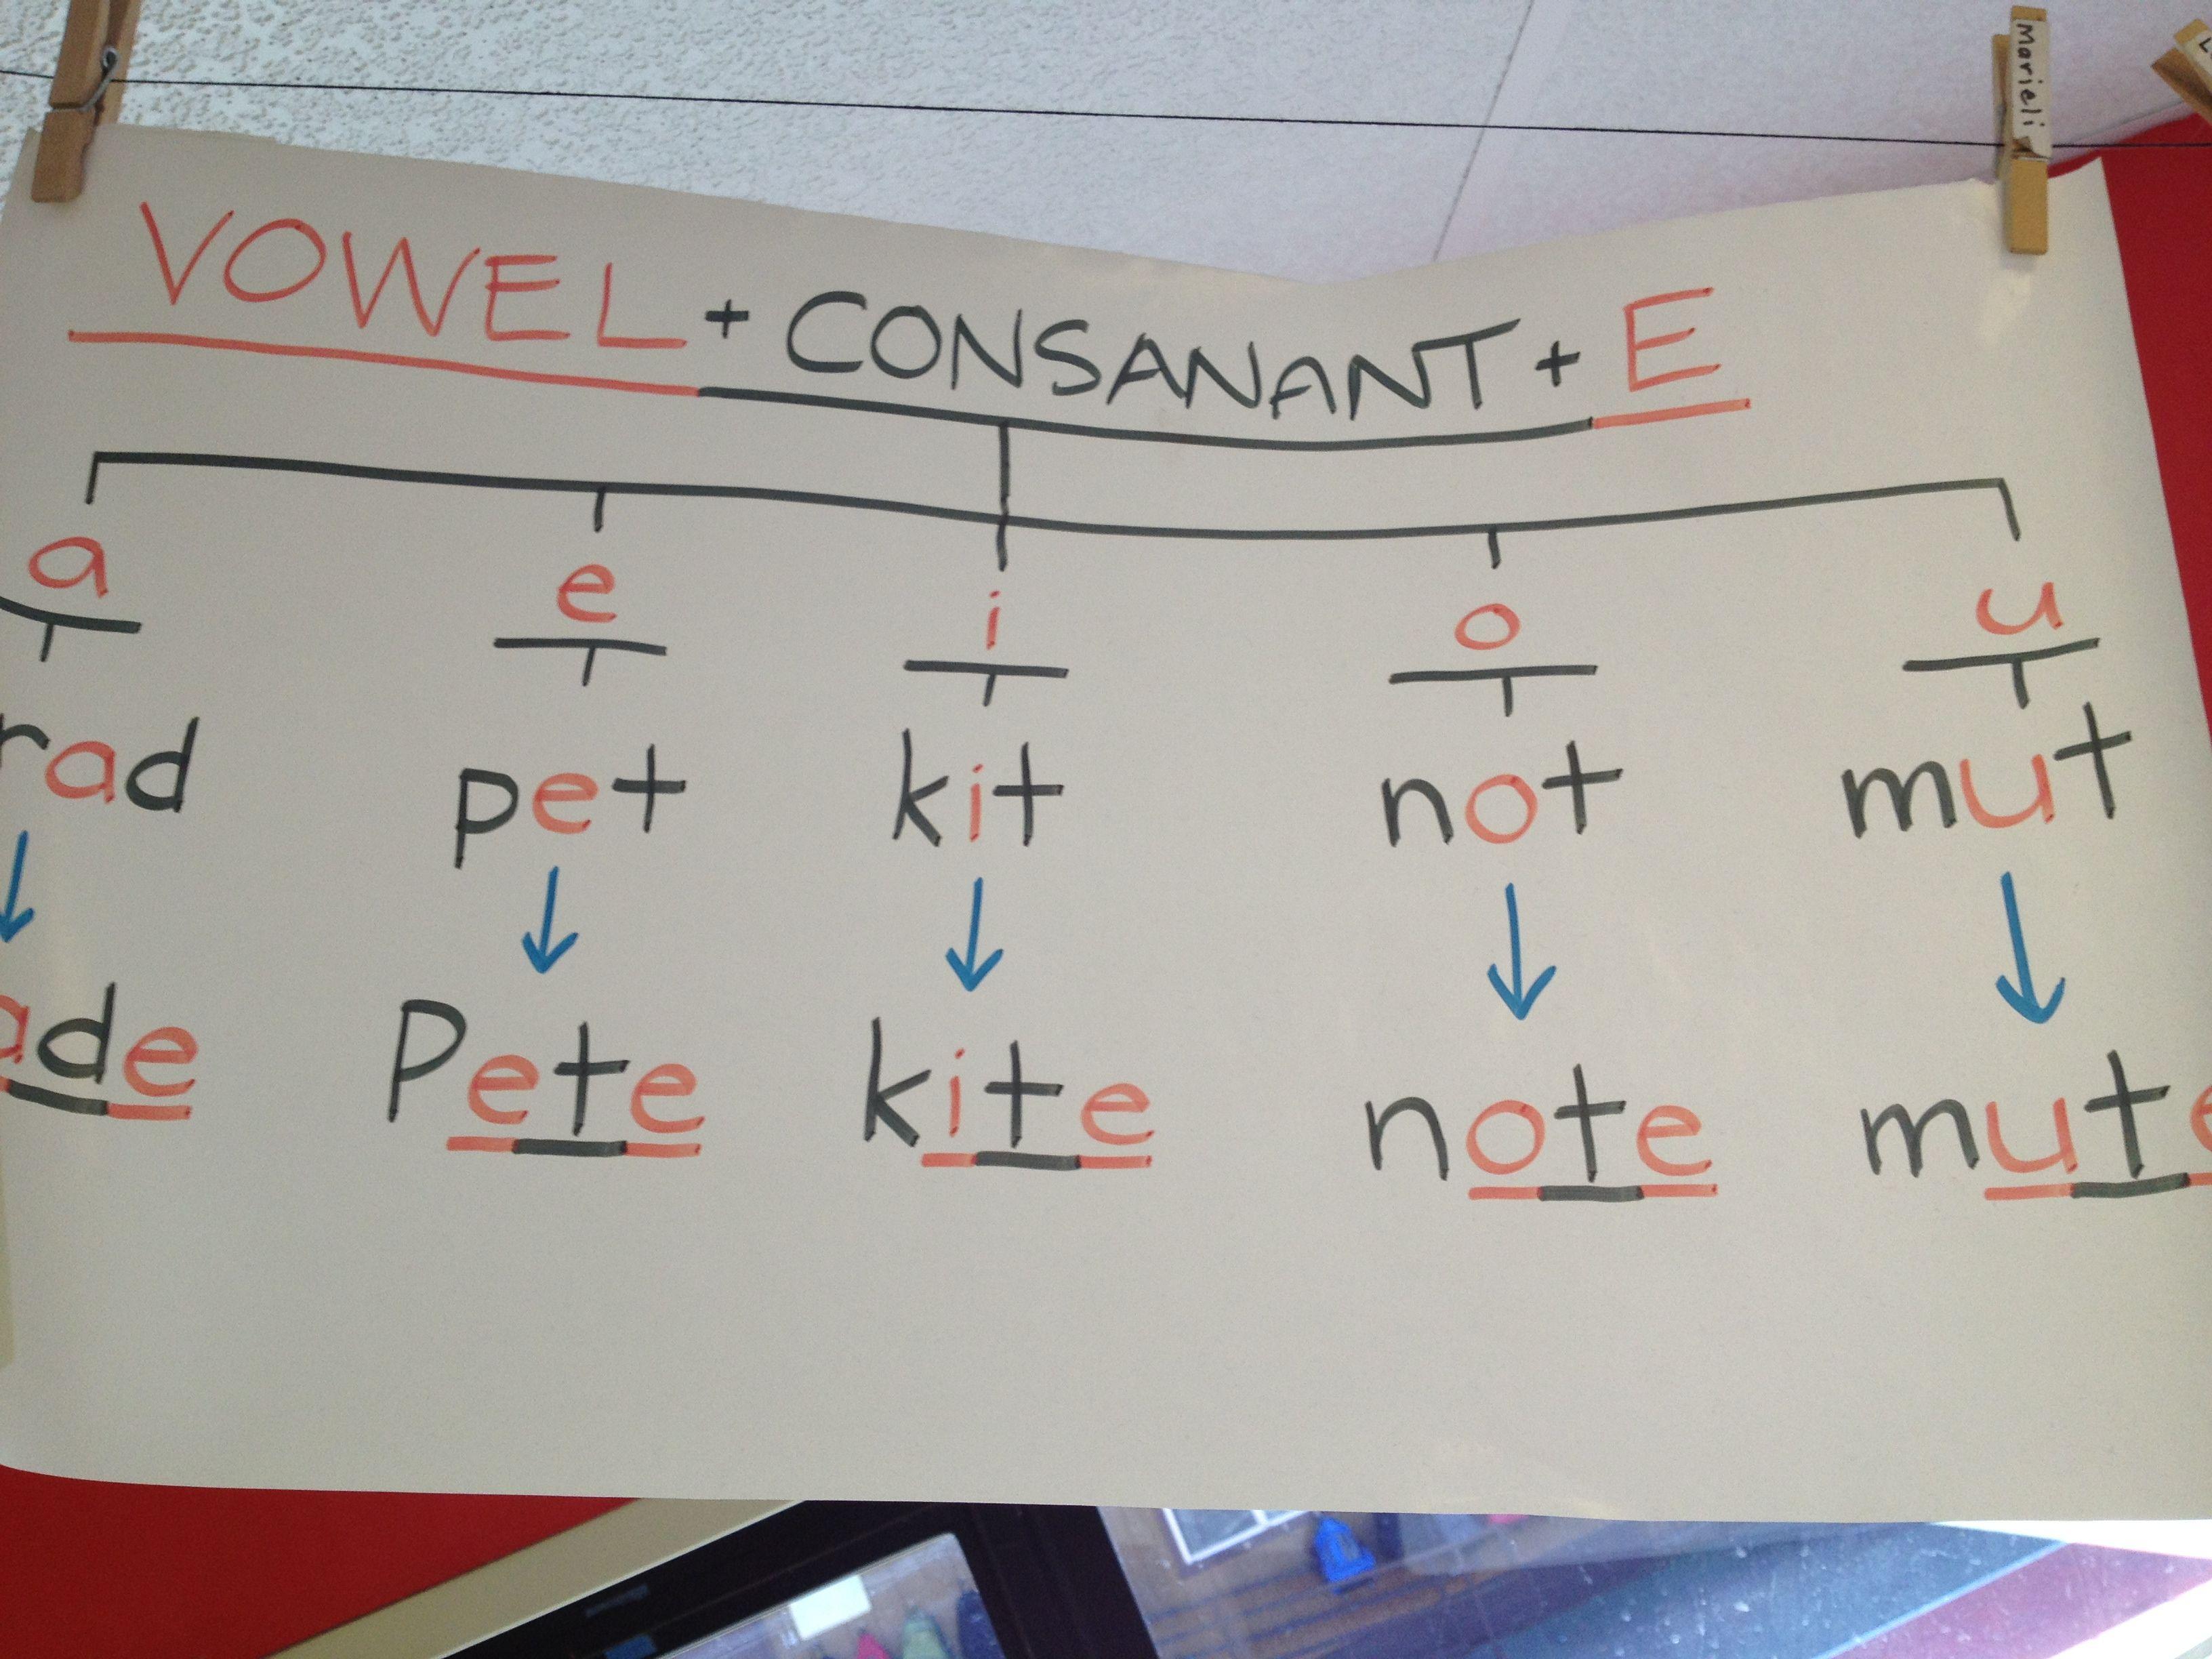 Vowel Consonant E Consonant Is Misspelled On Poster